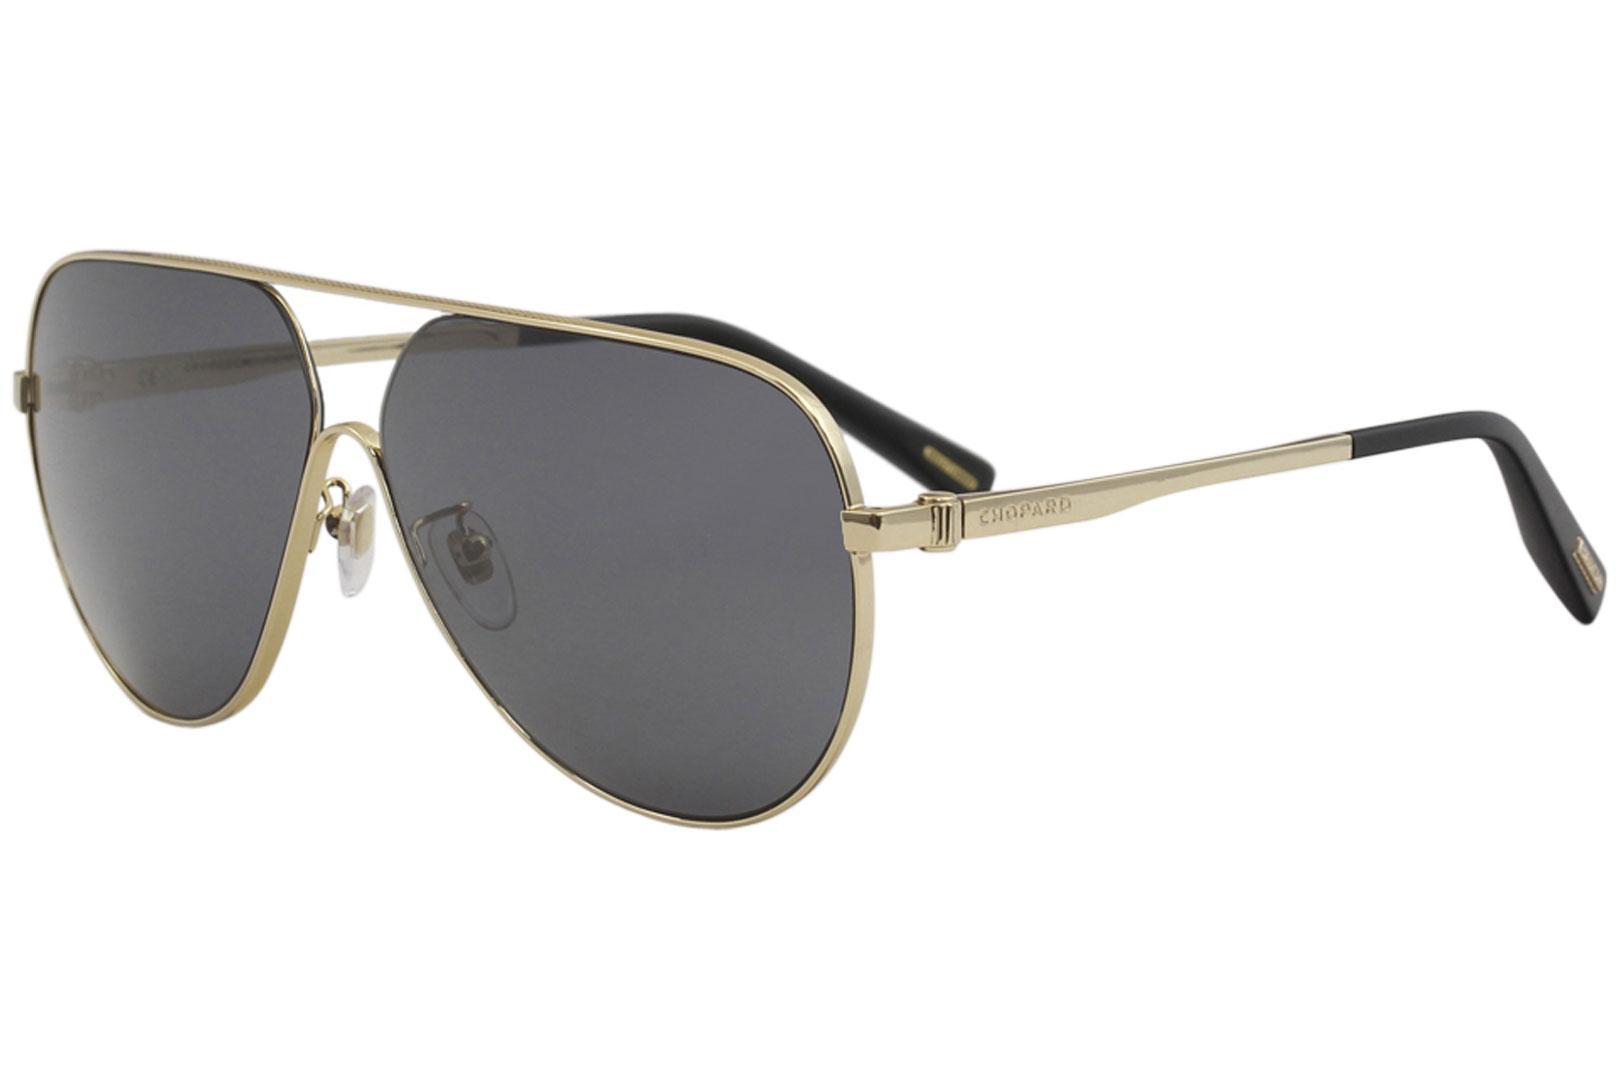 Chopard Schc30 Men's Polarized Pilot Sunglasses Fashion mnyw8ON0v